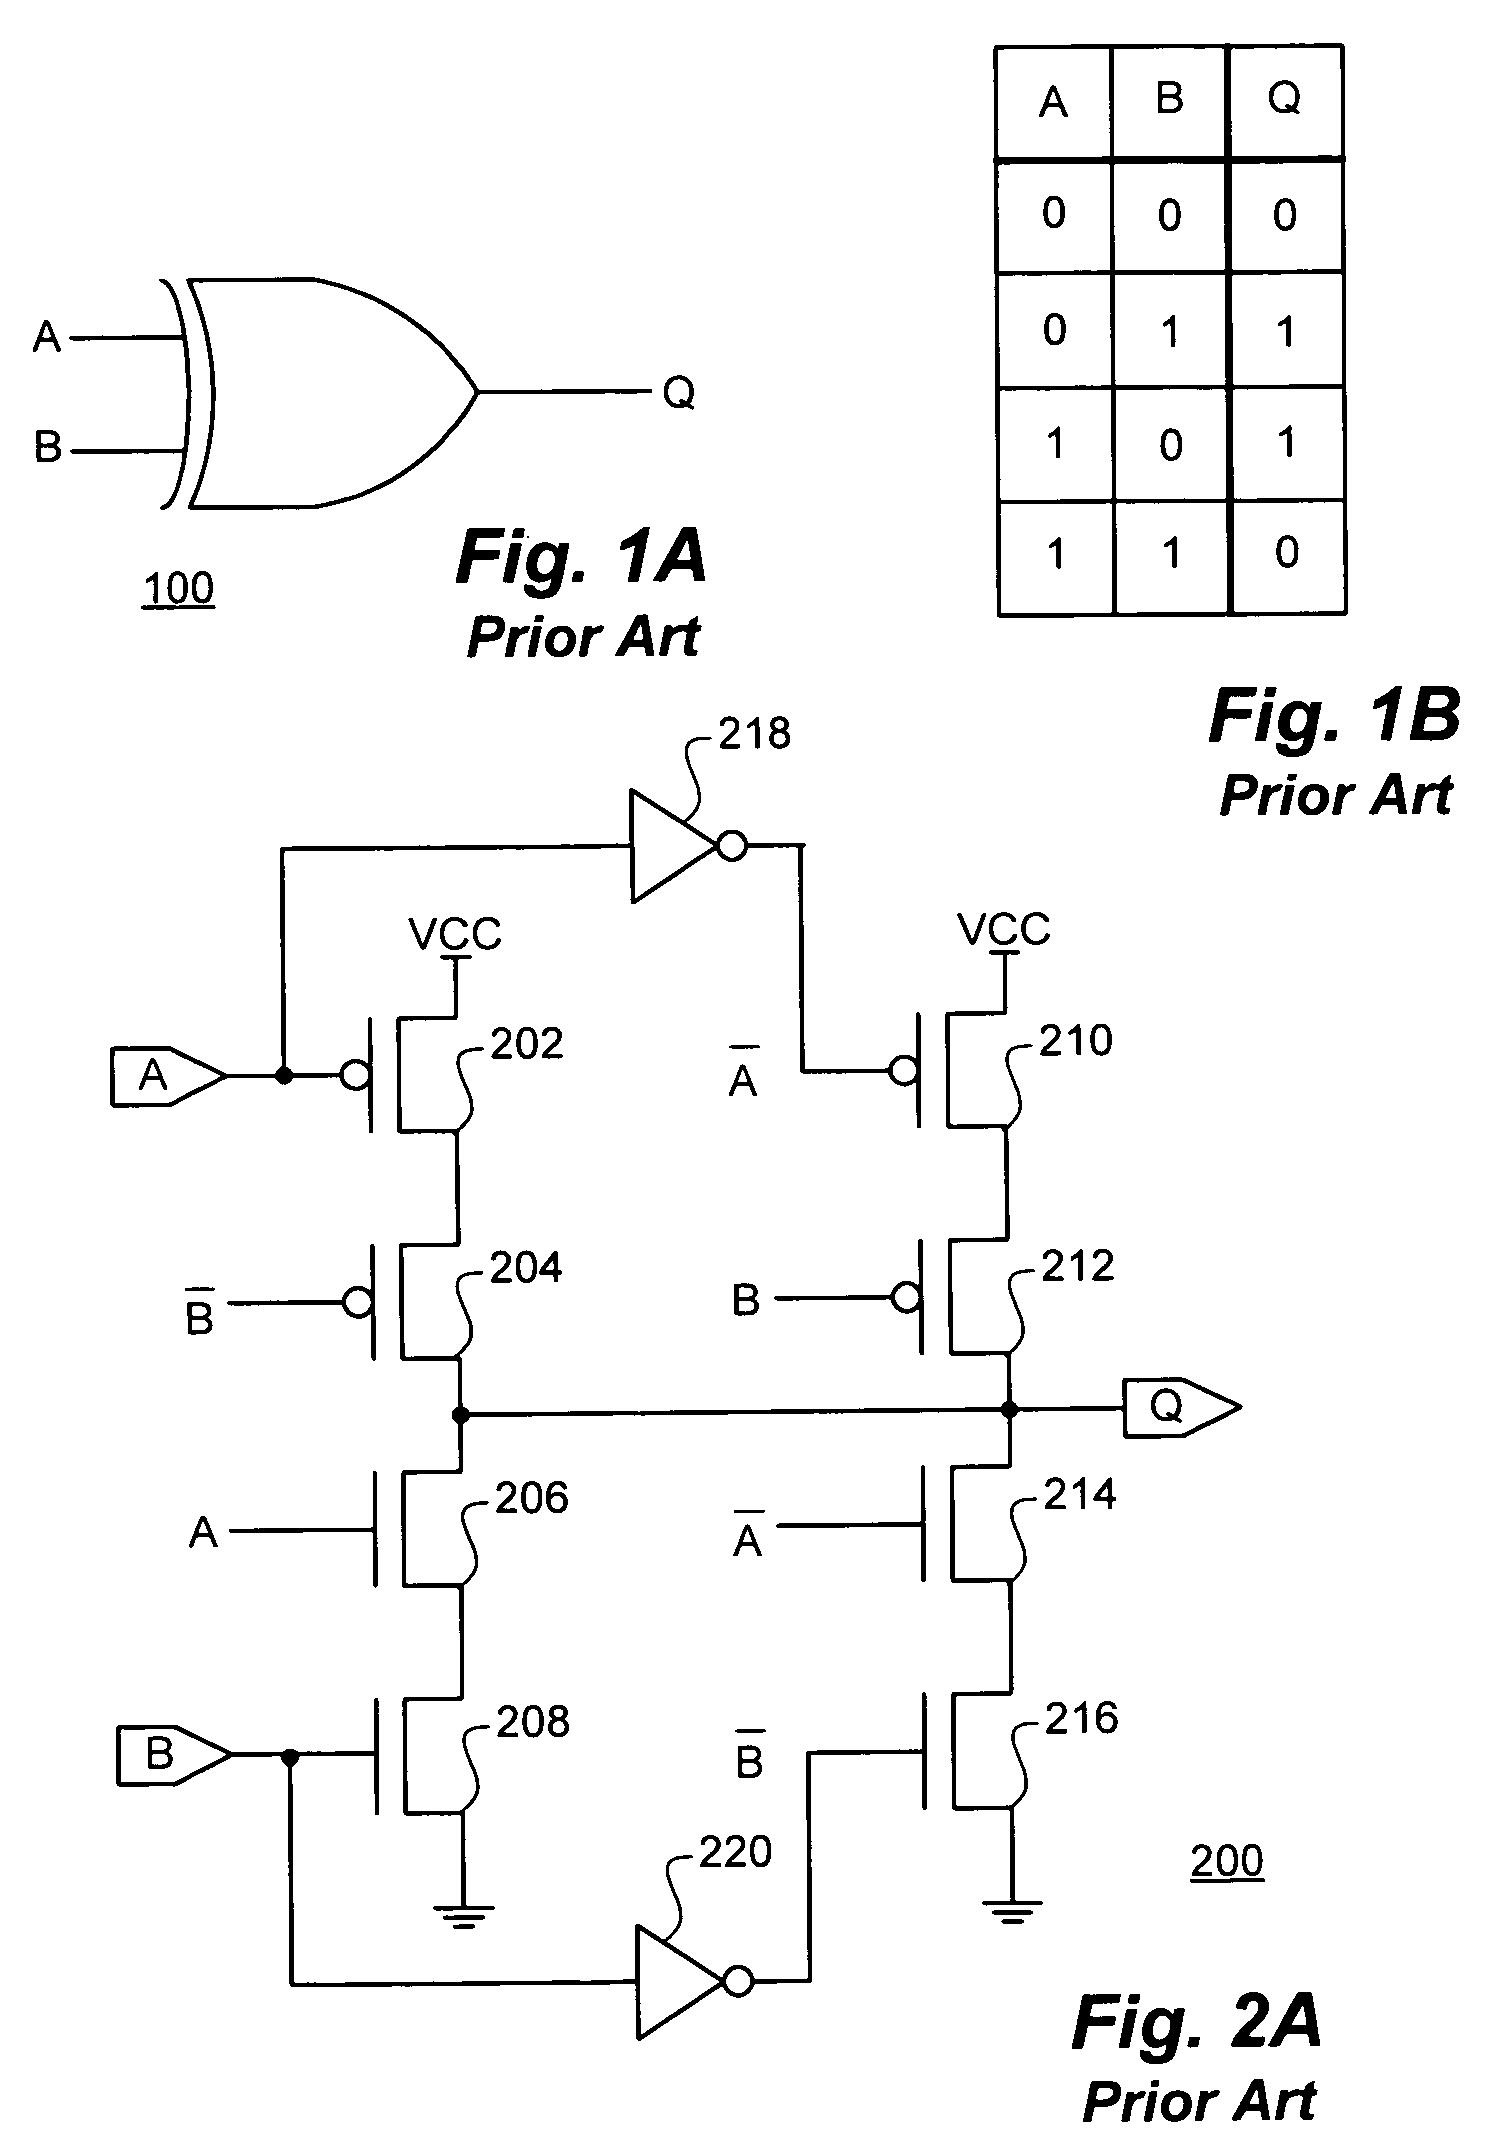 hight resolution of logic diagram of xor gate